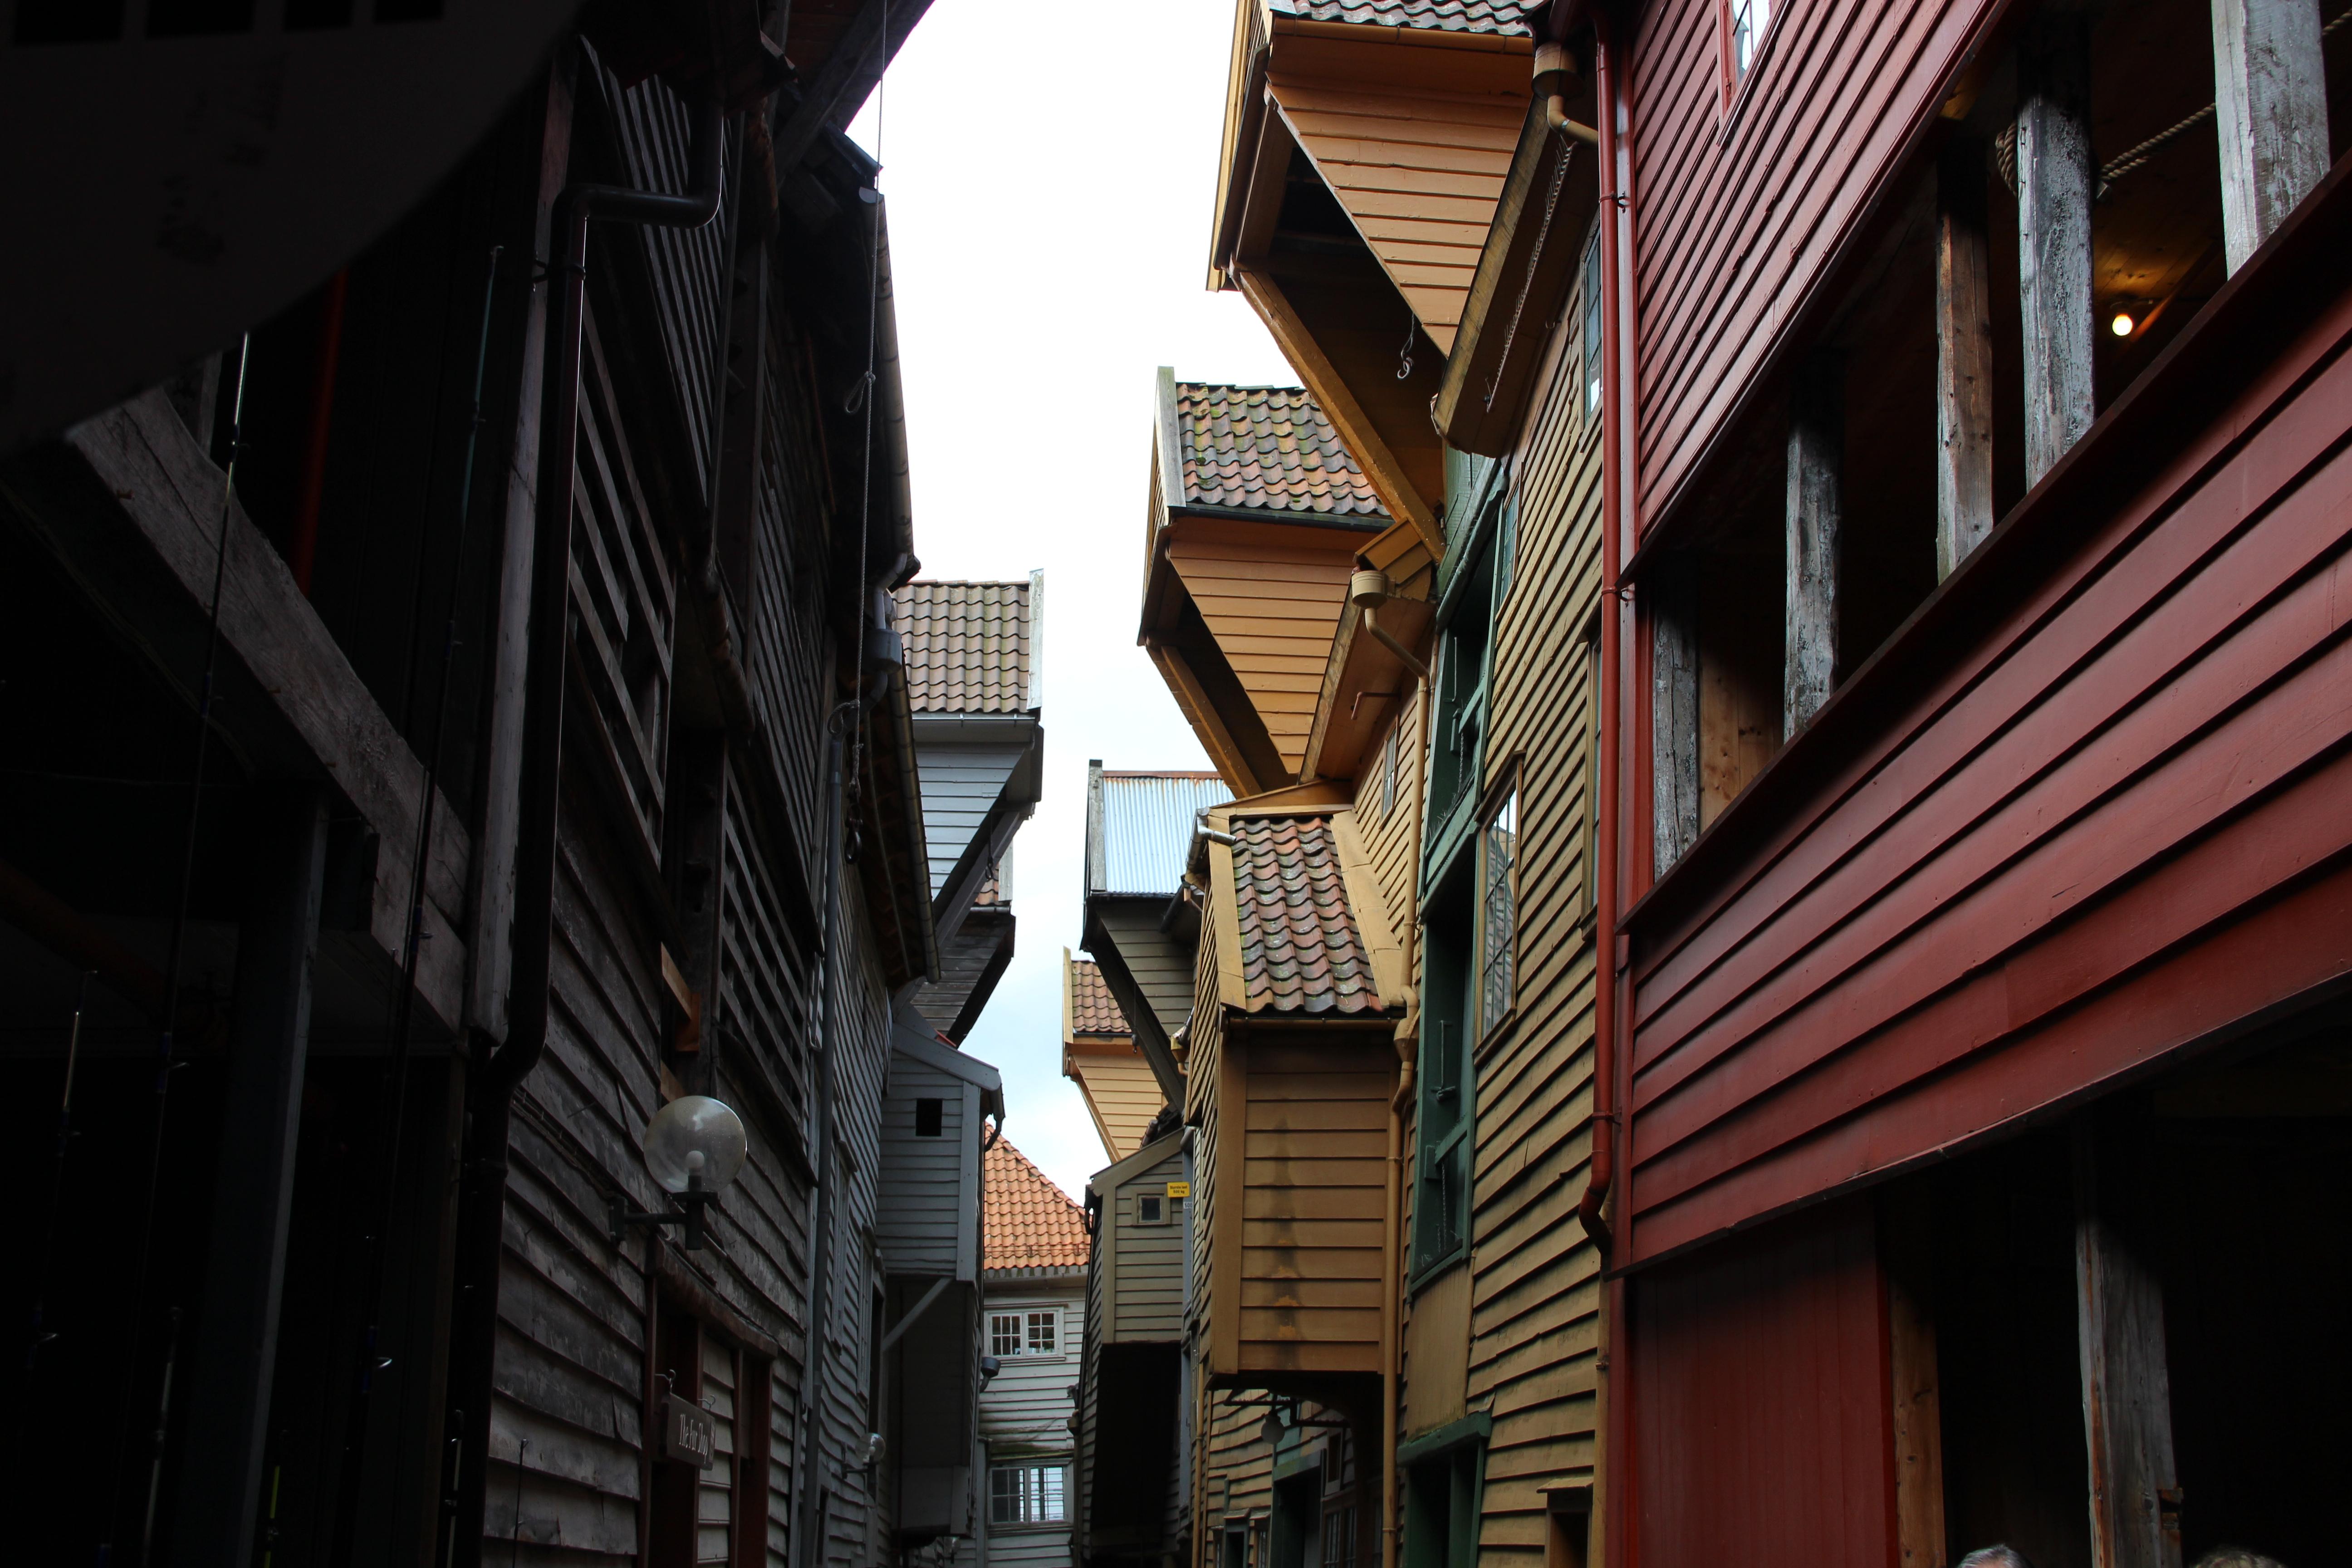 Rue hanséatique